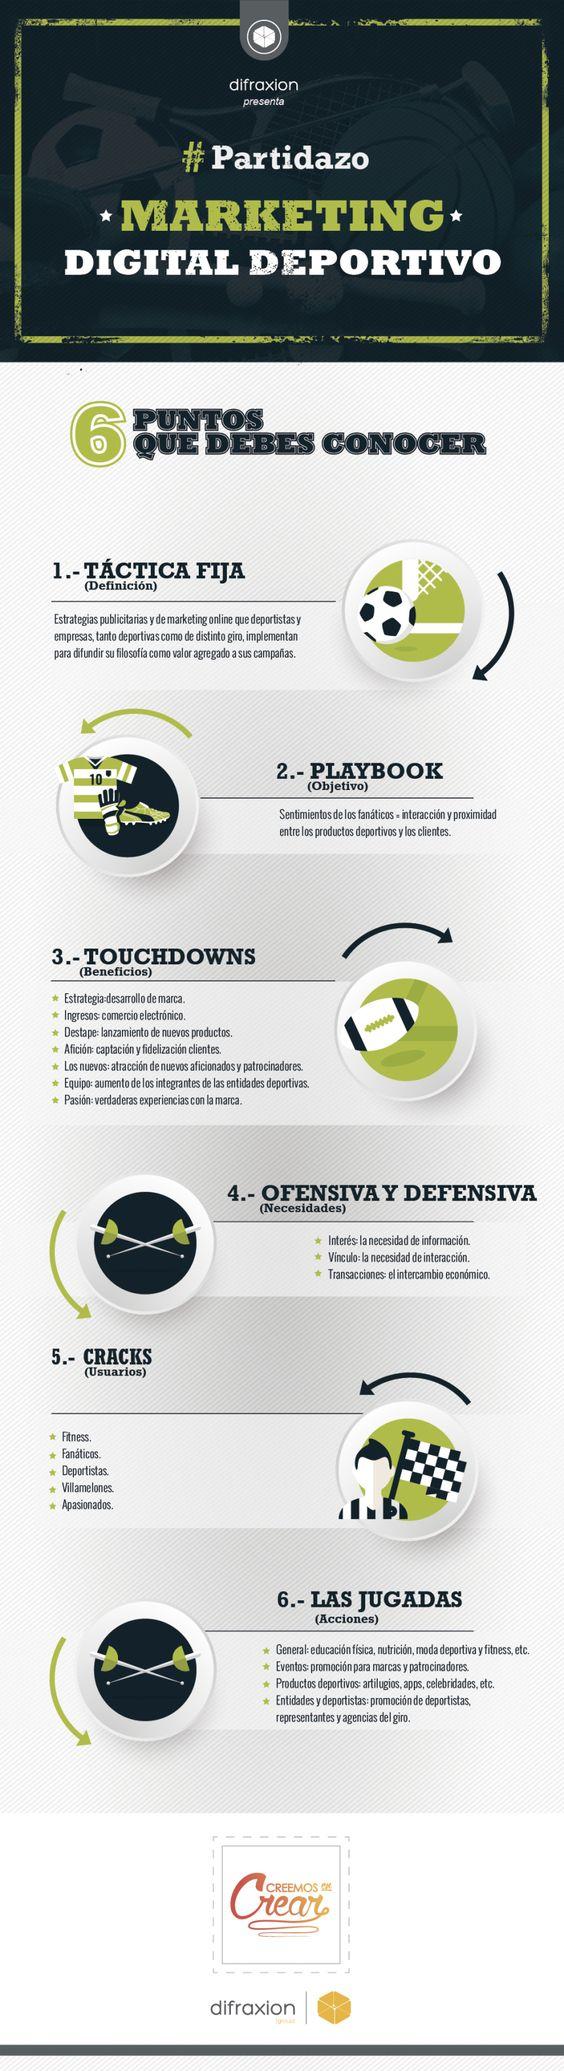 Marketing Digital Deportivo #infografia #infographic #marketing